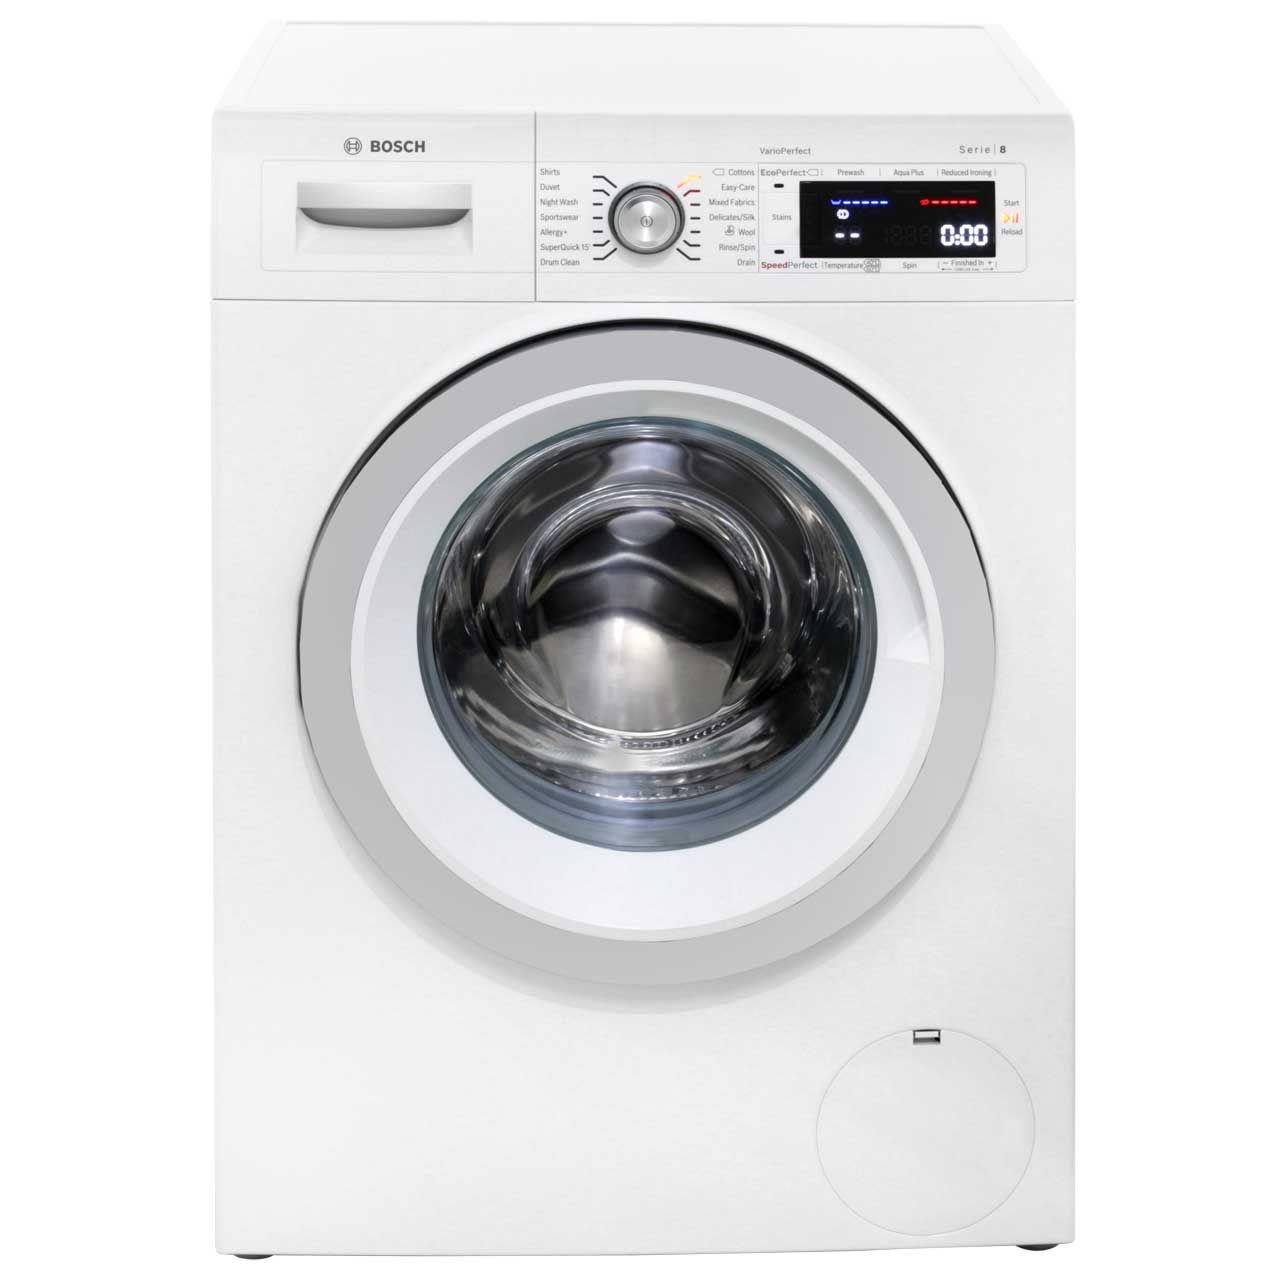 Bosch Serie 8 9kg Washing Machine Waw32560gb Ao Com Washing Machine Bosch Free Standing